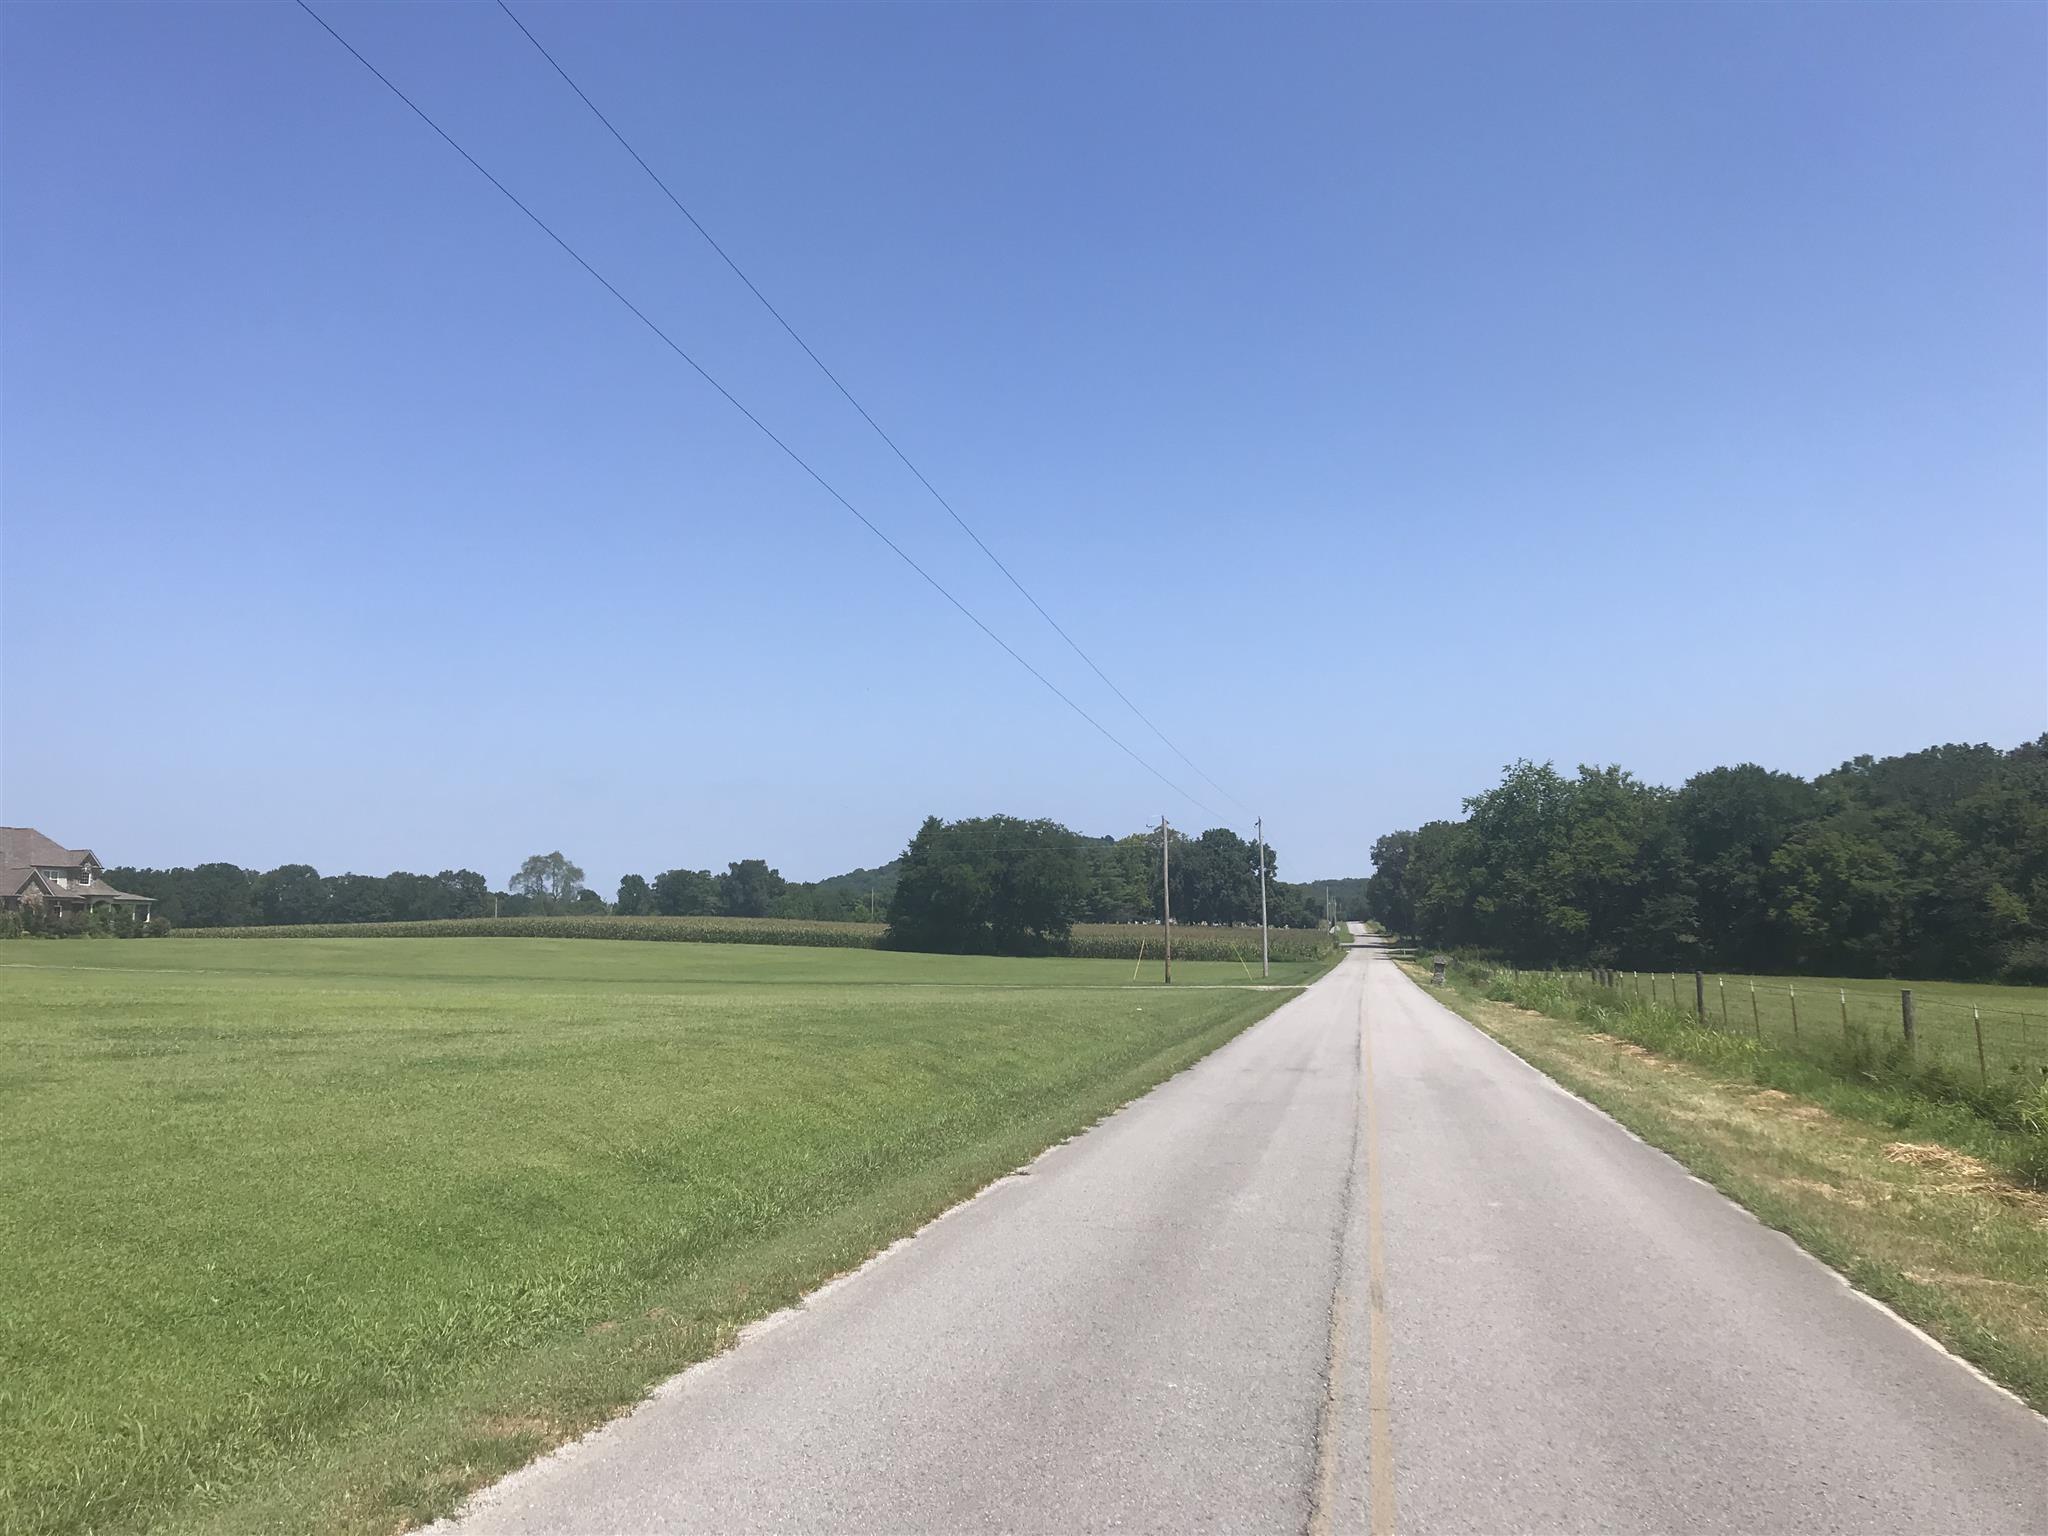 0 Haunt Hollow Rd, Unionville, TN 37180 - Unionville, TN real estate listing